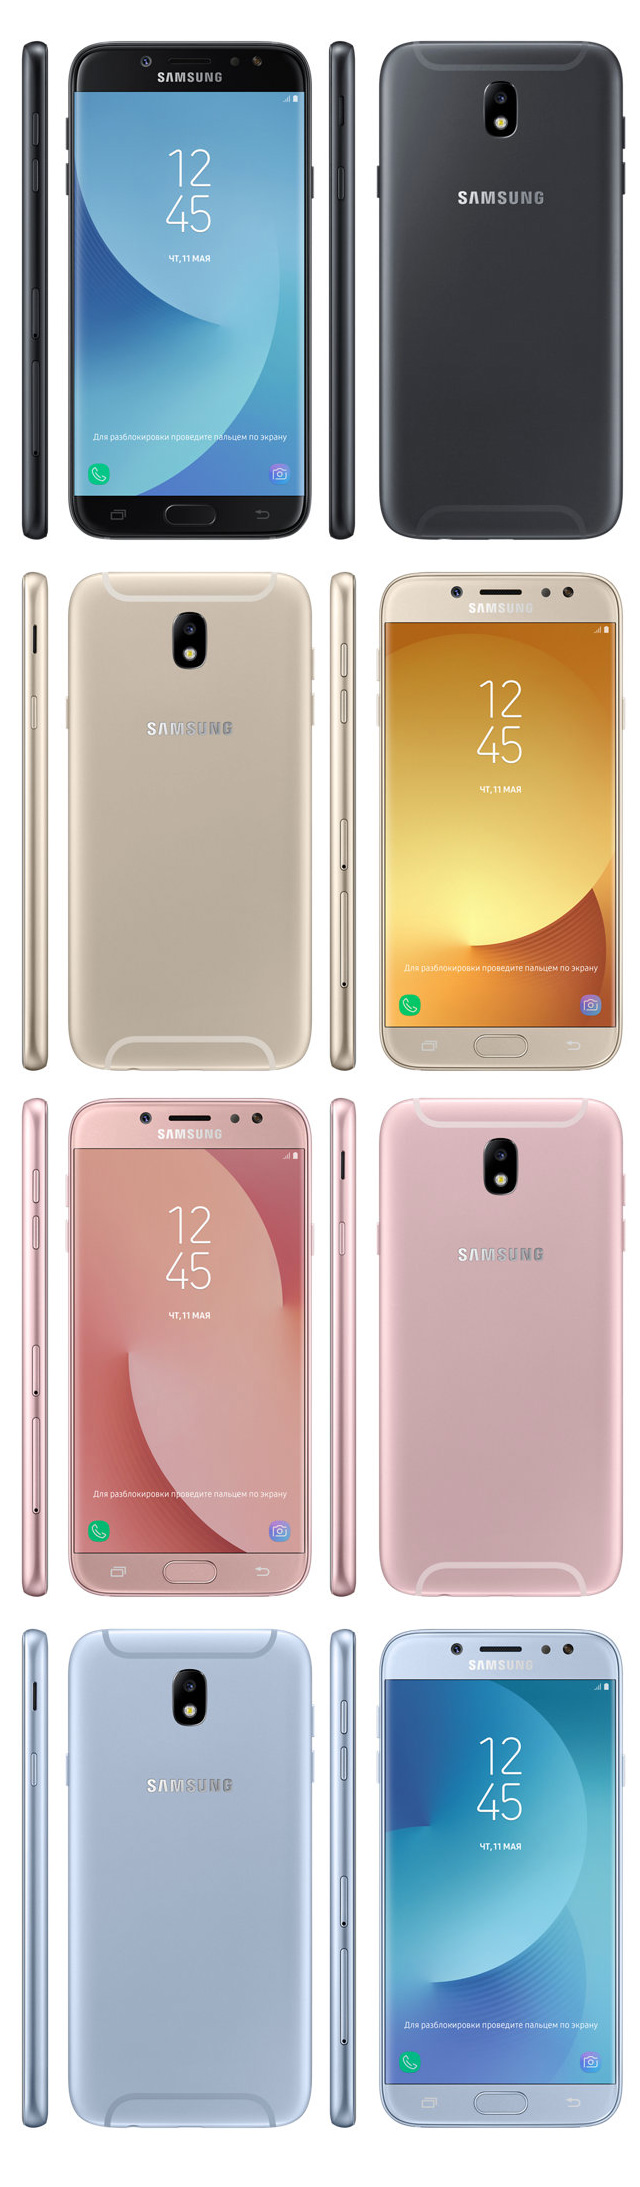 Mobile-review com Обзор смартфона Samsung Galaxy J7 2017 (SM